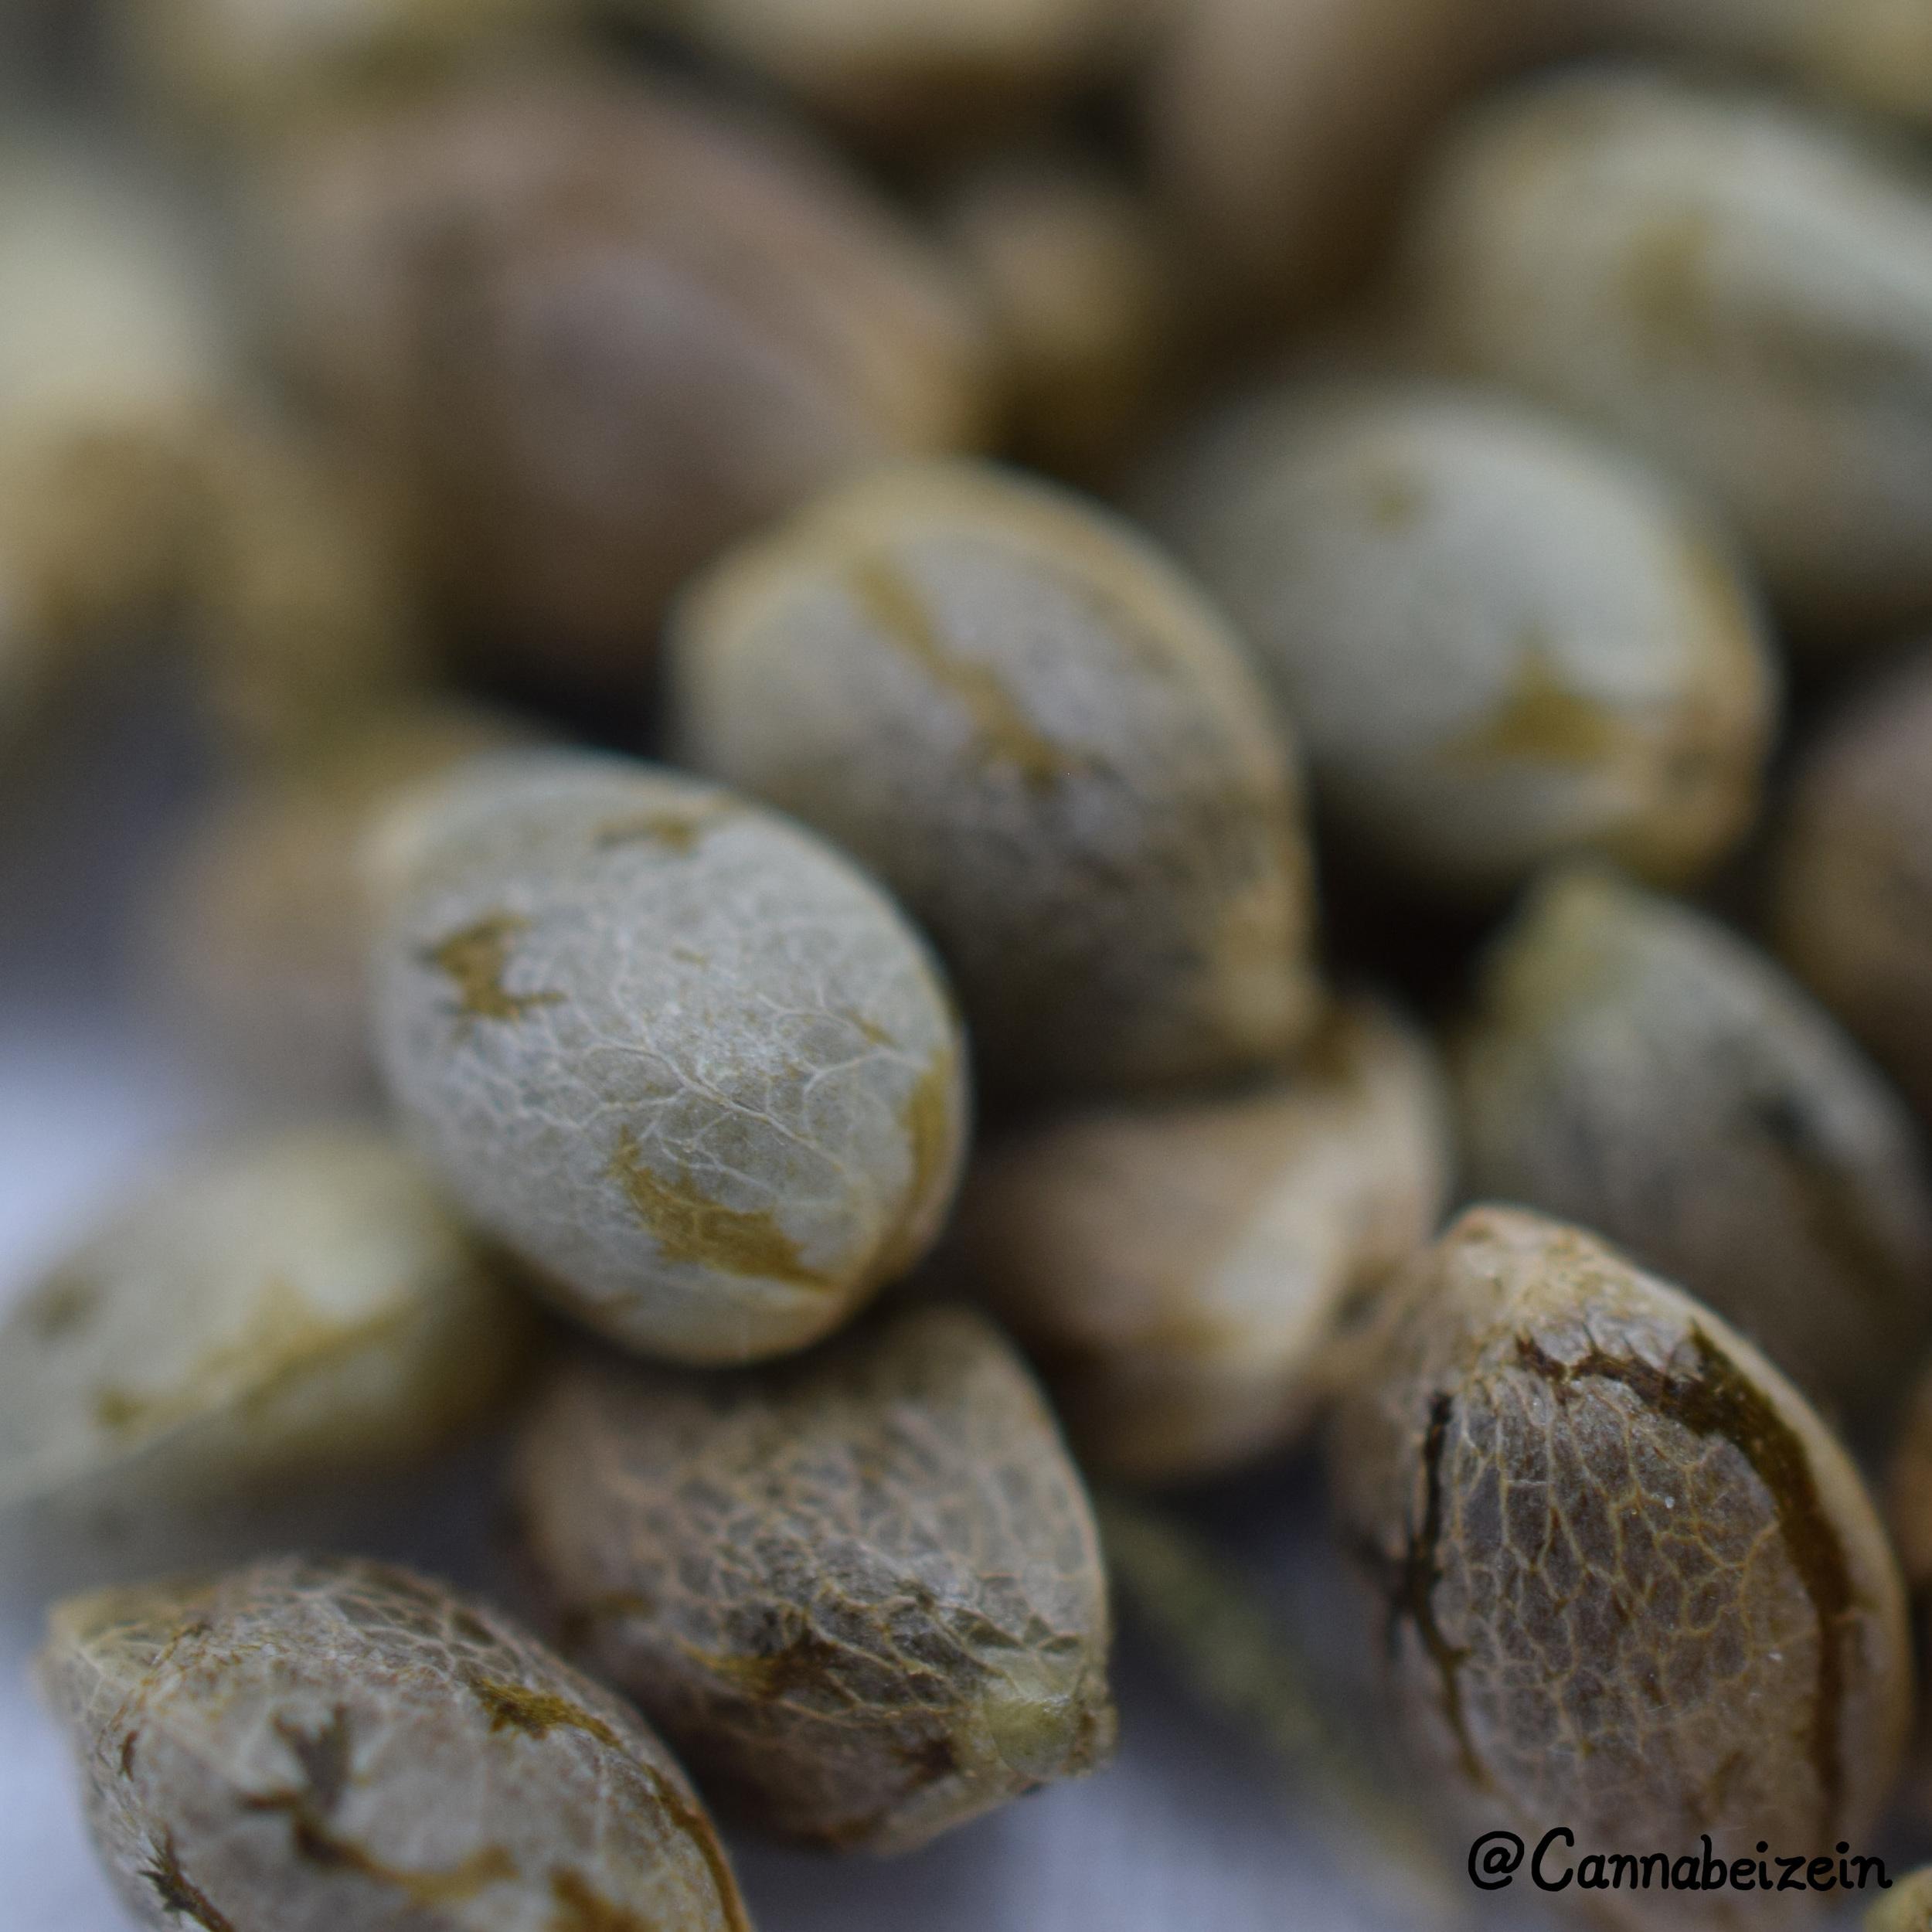 Cannabeizein 0234 - Mystery Mix Seeds - DSC_0830 copy.jpg